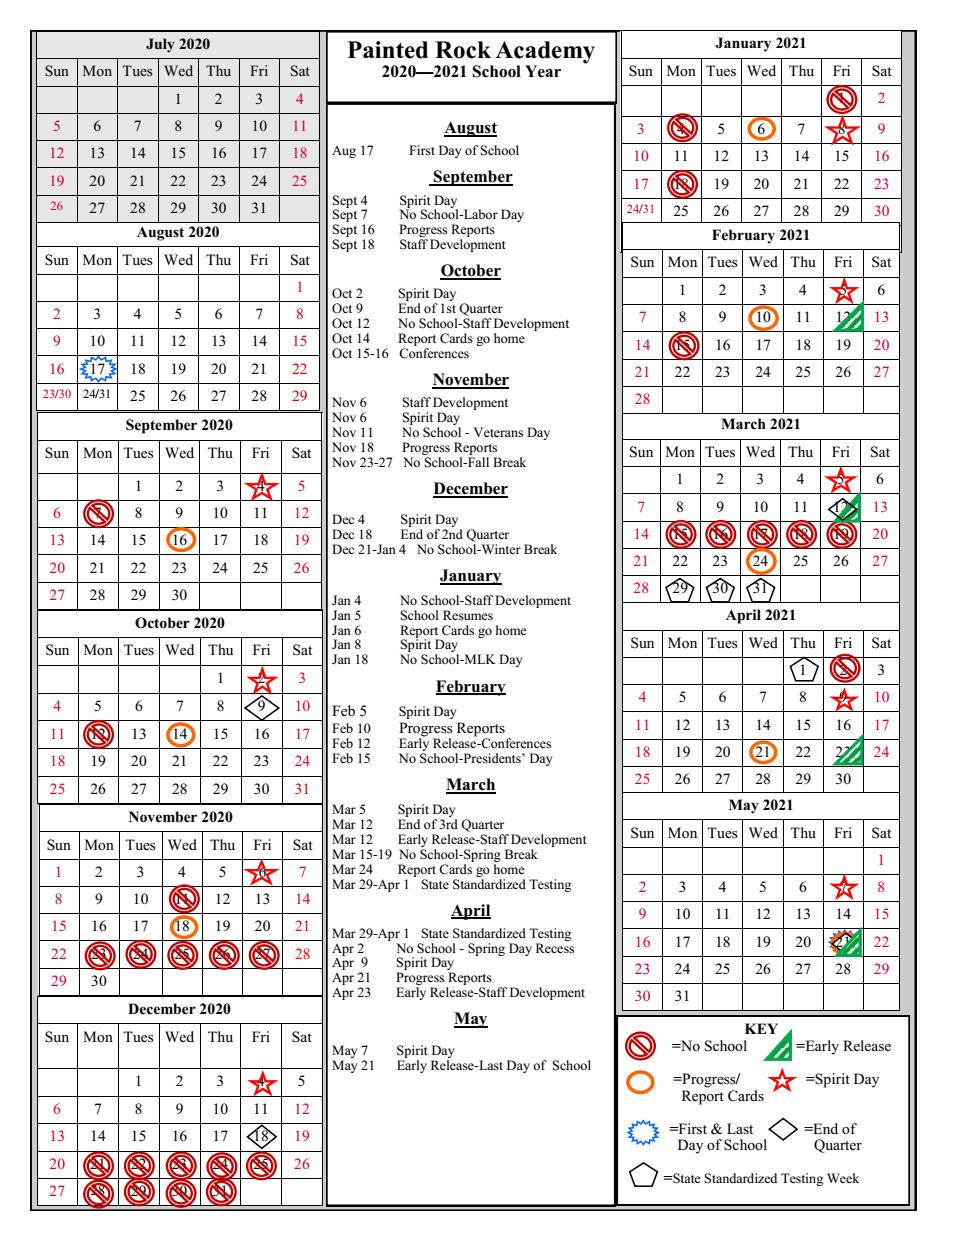 School Year Calendar 2020-2021   Painted Rock Academy